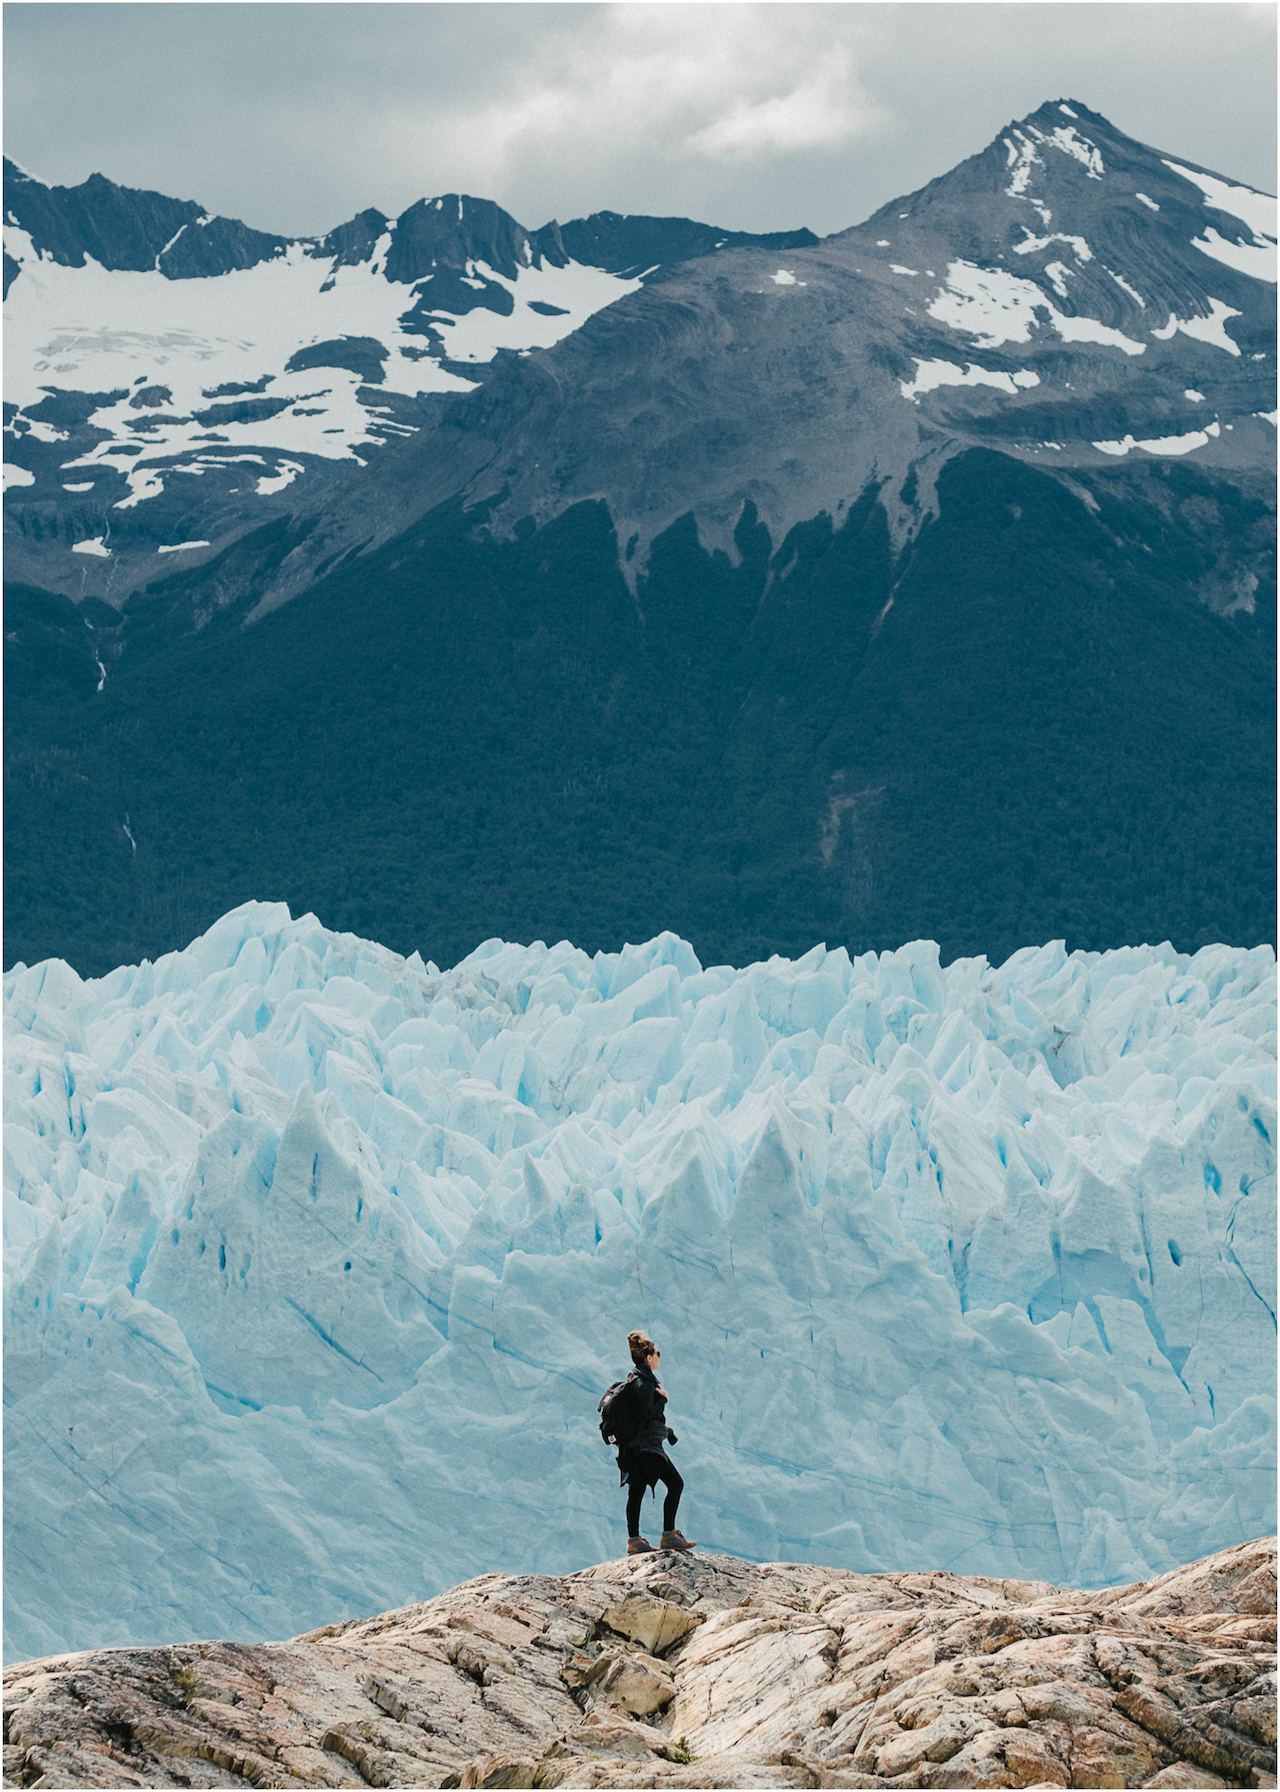 argentina-patagonia-travel-279a.jpg